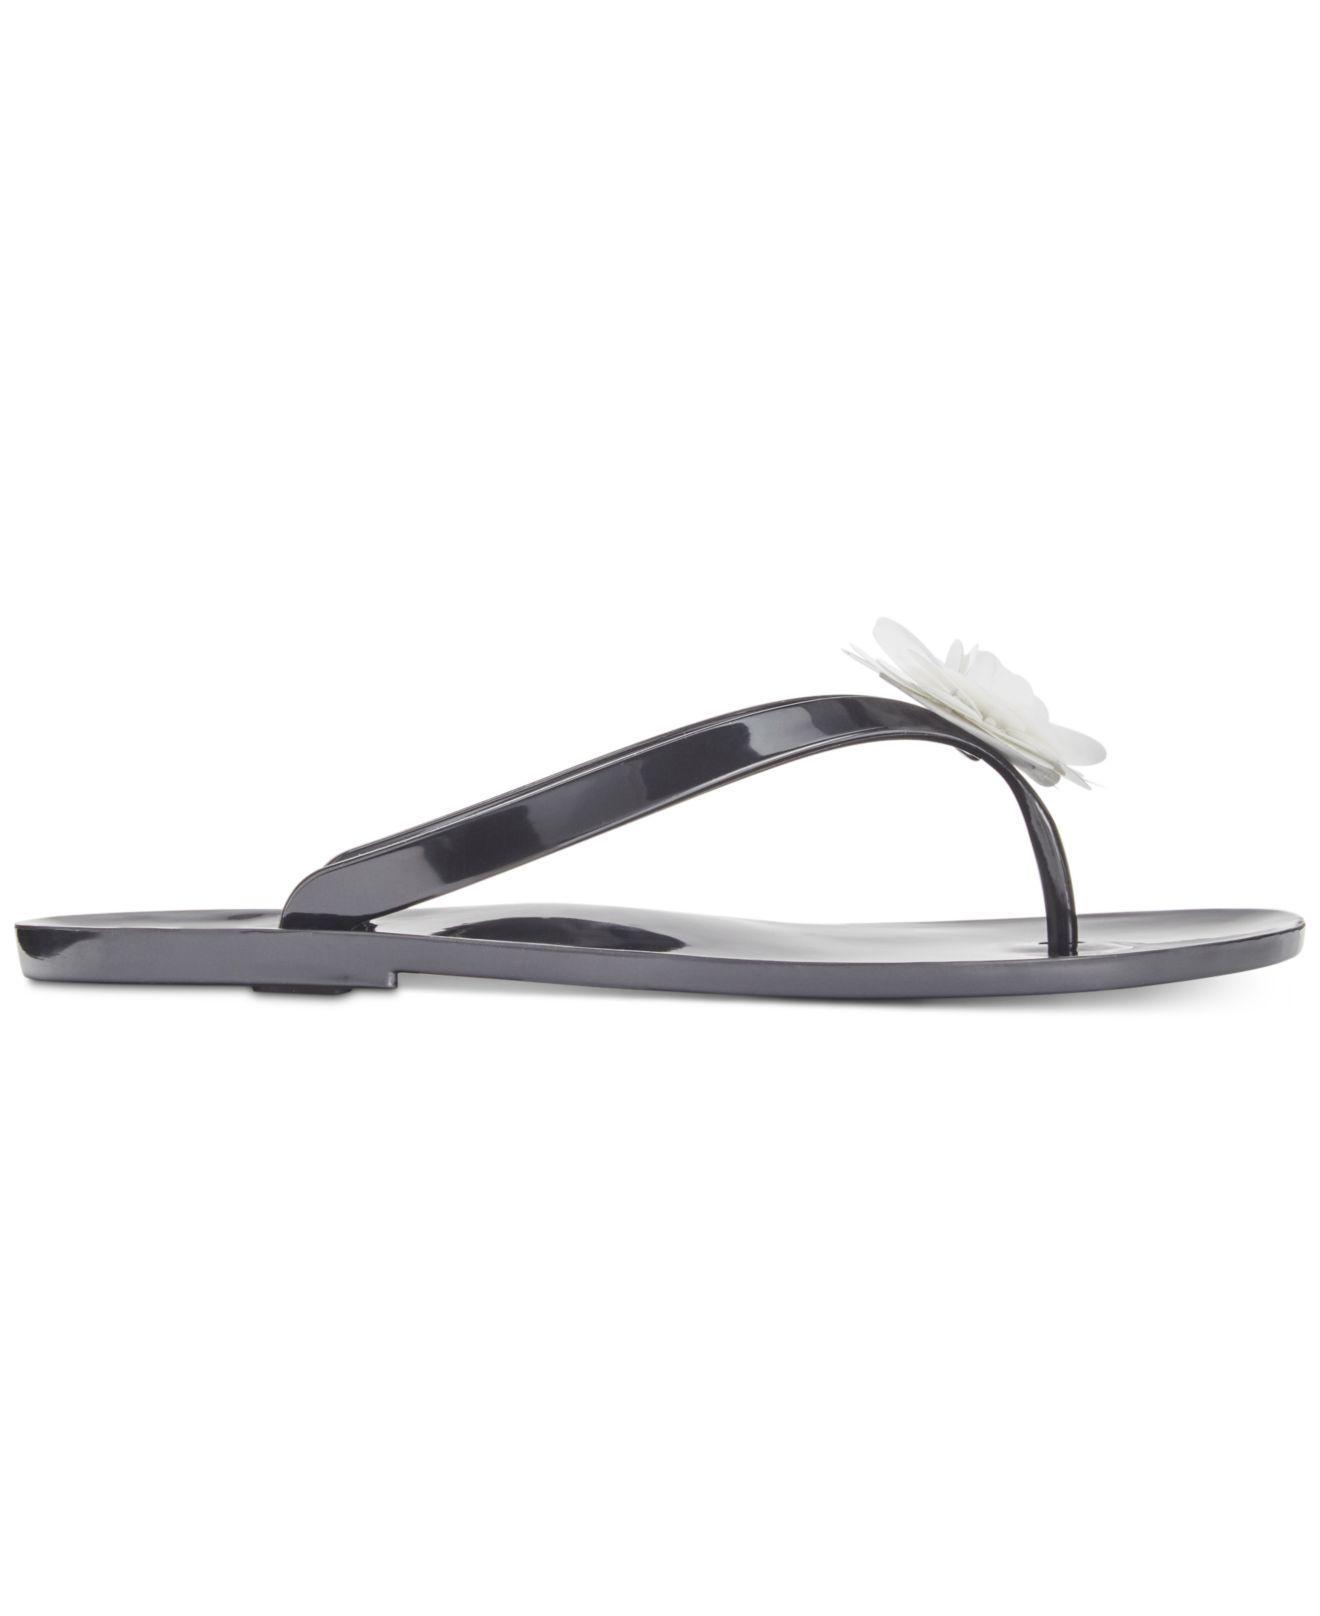 f9130bbceb23 Lyst - Kate Spade Fiorina Jelly Flip Flops in Black